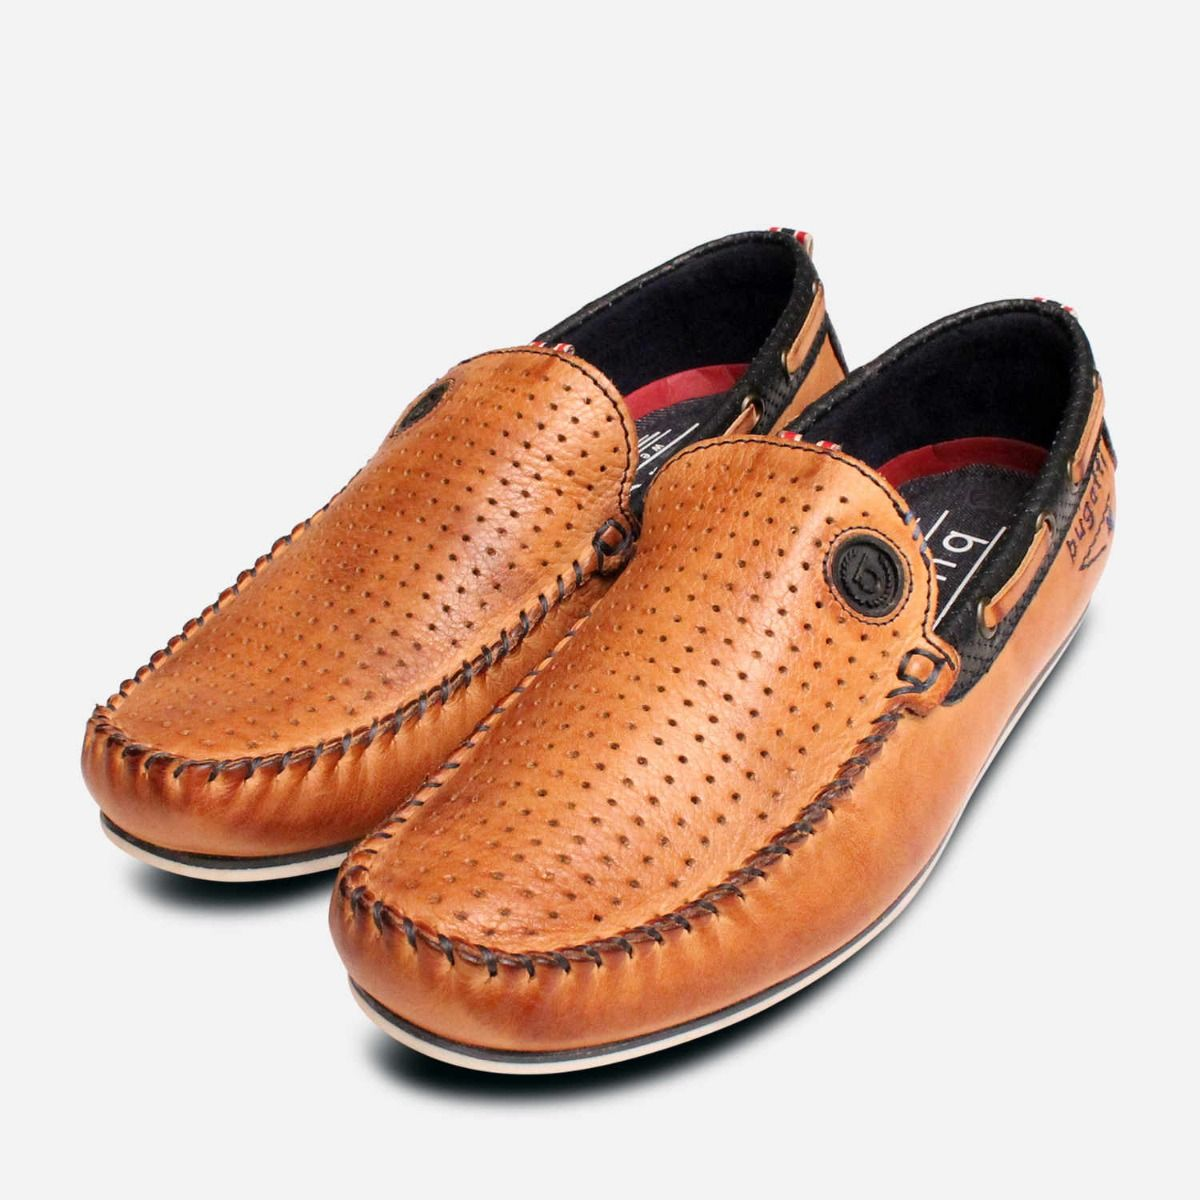 Bugatti Shoes Designer Tan Brown